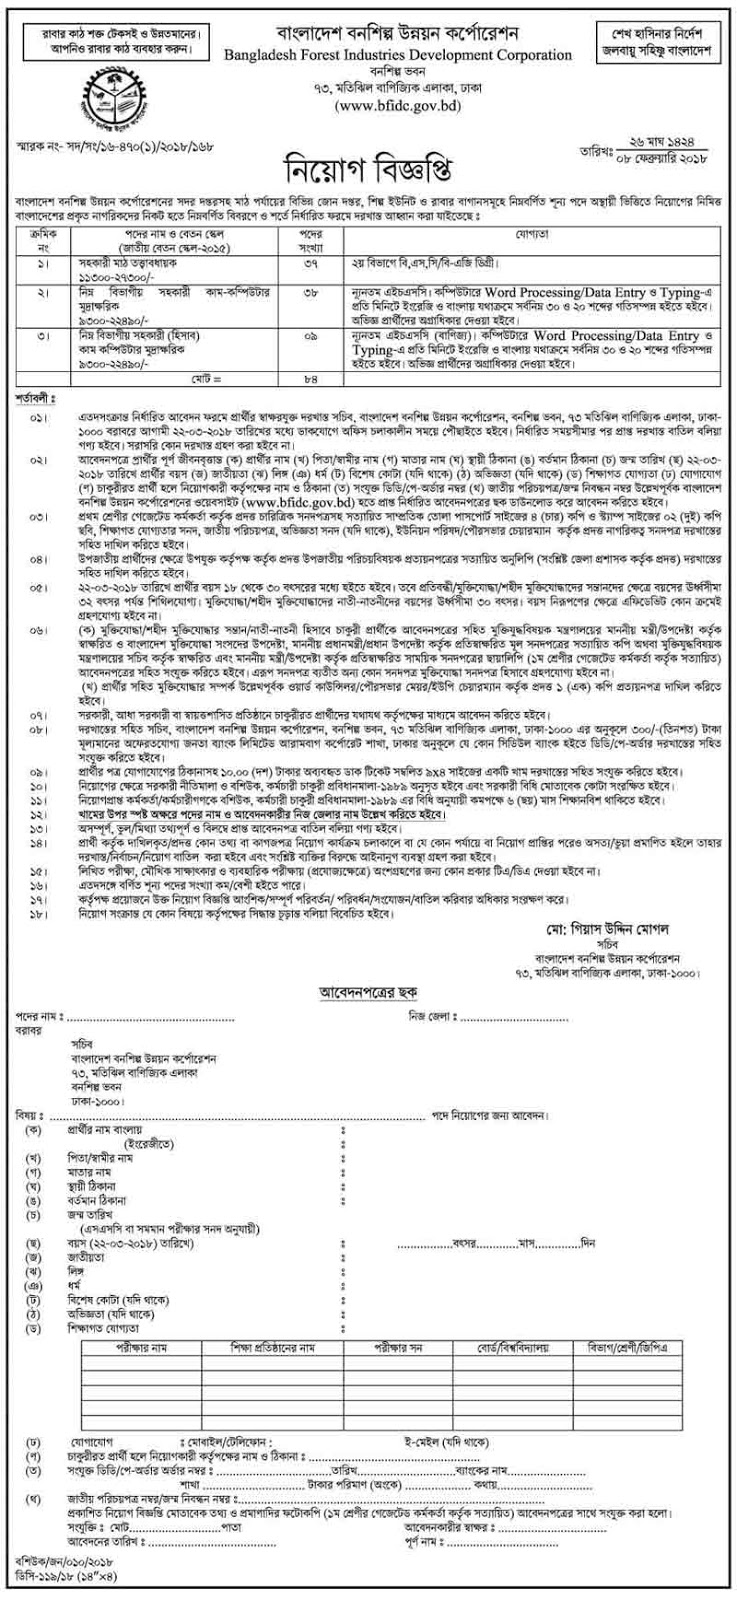 Bangladesh Forest Industry Development Corporation Job Circular 2018 1